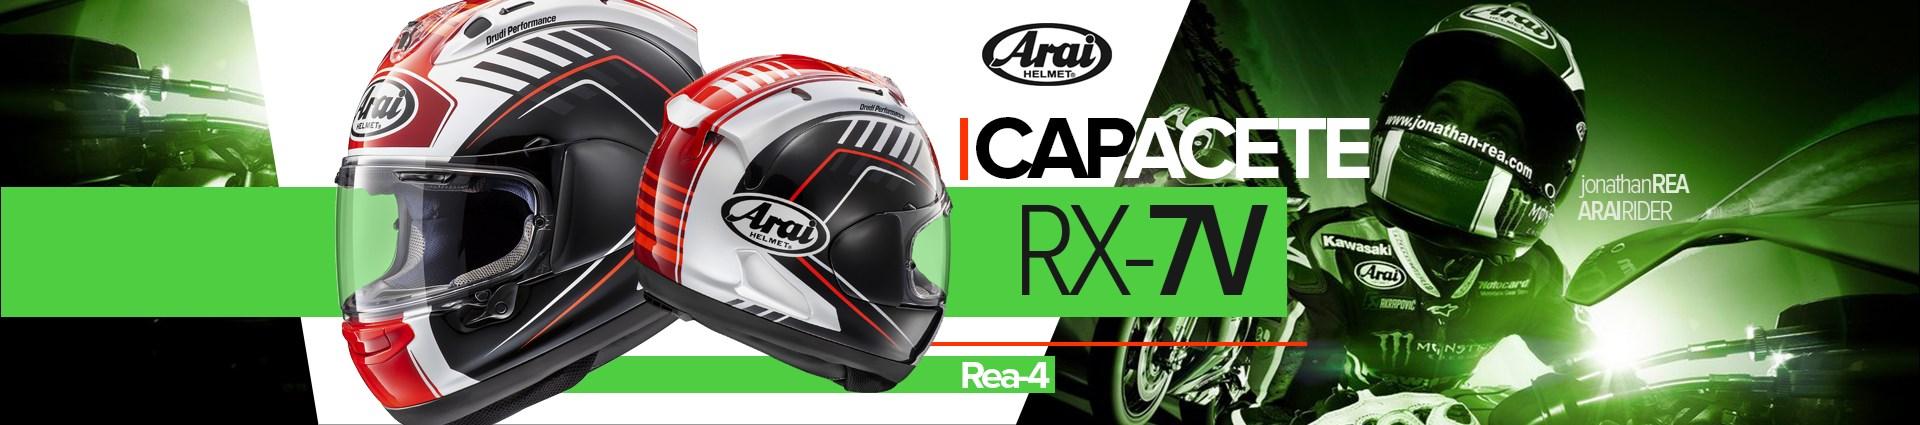 LP Arai - RX7